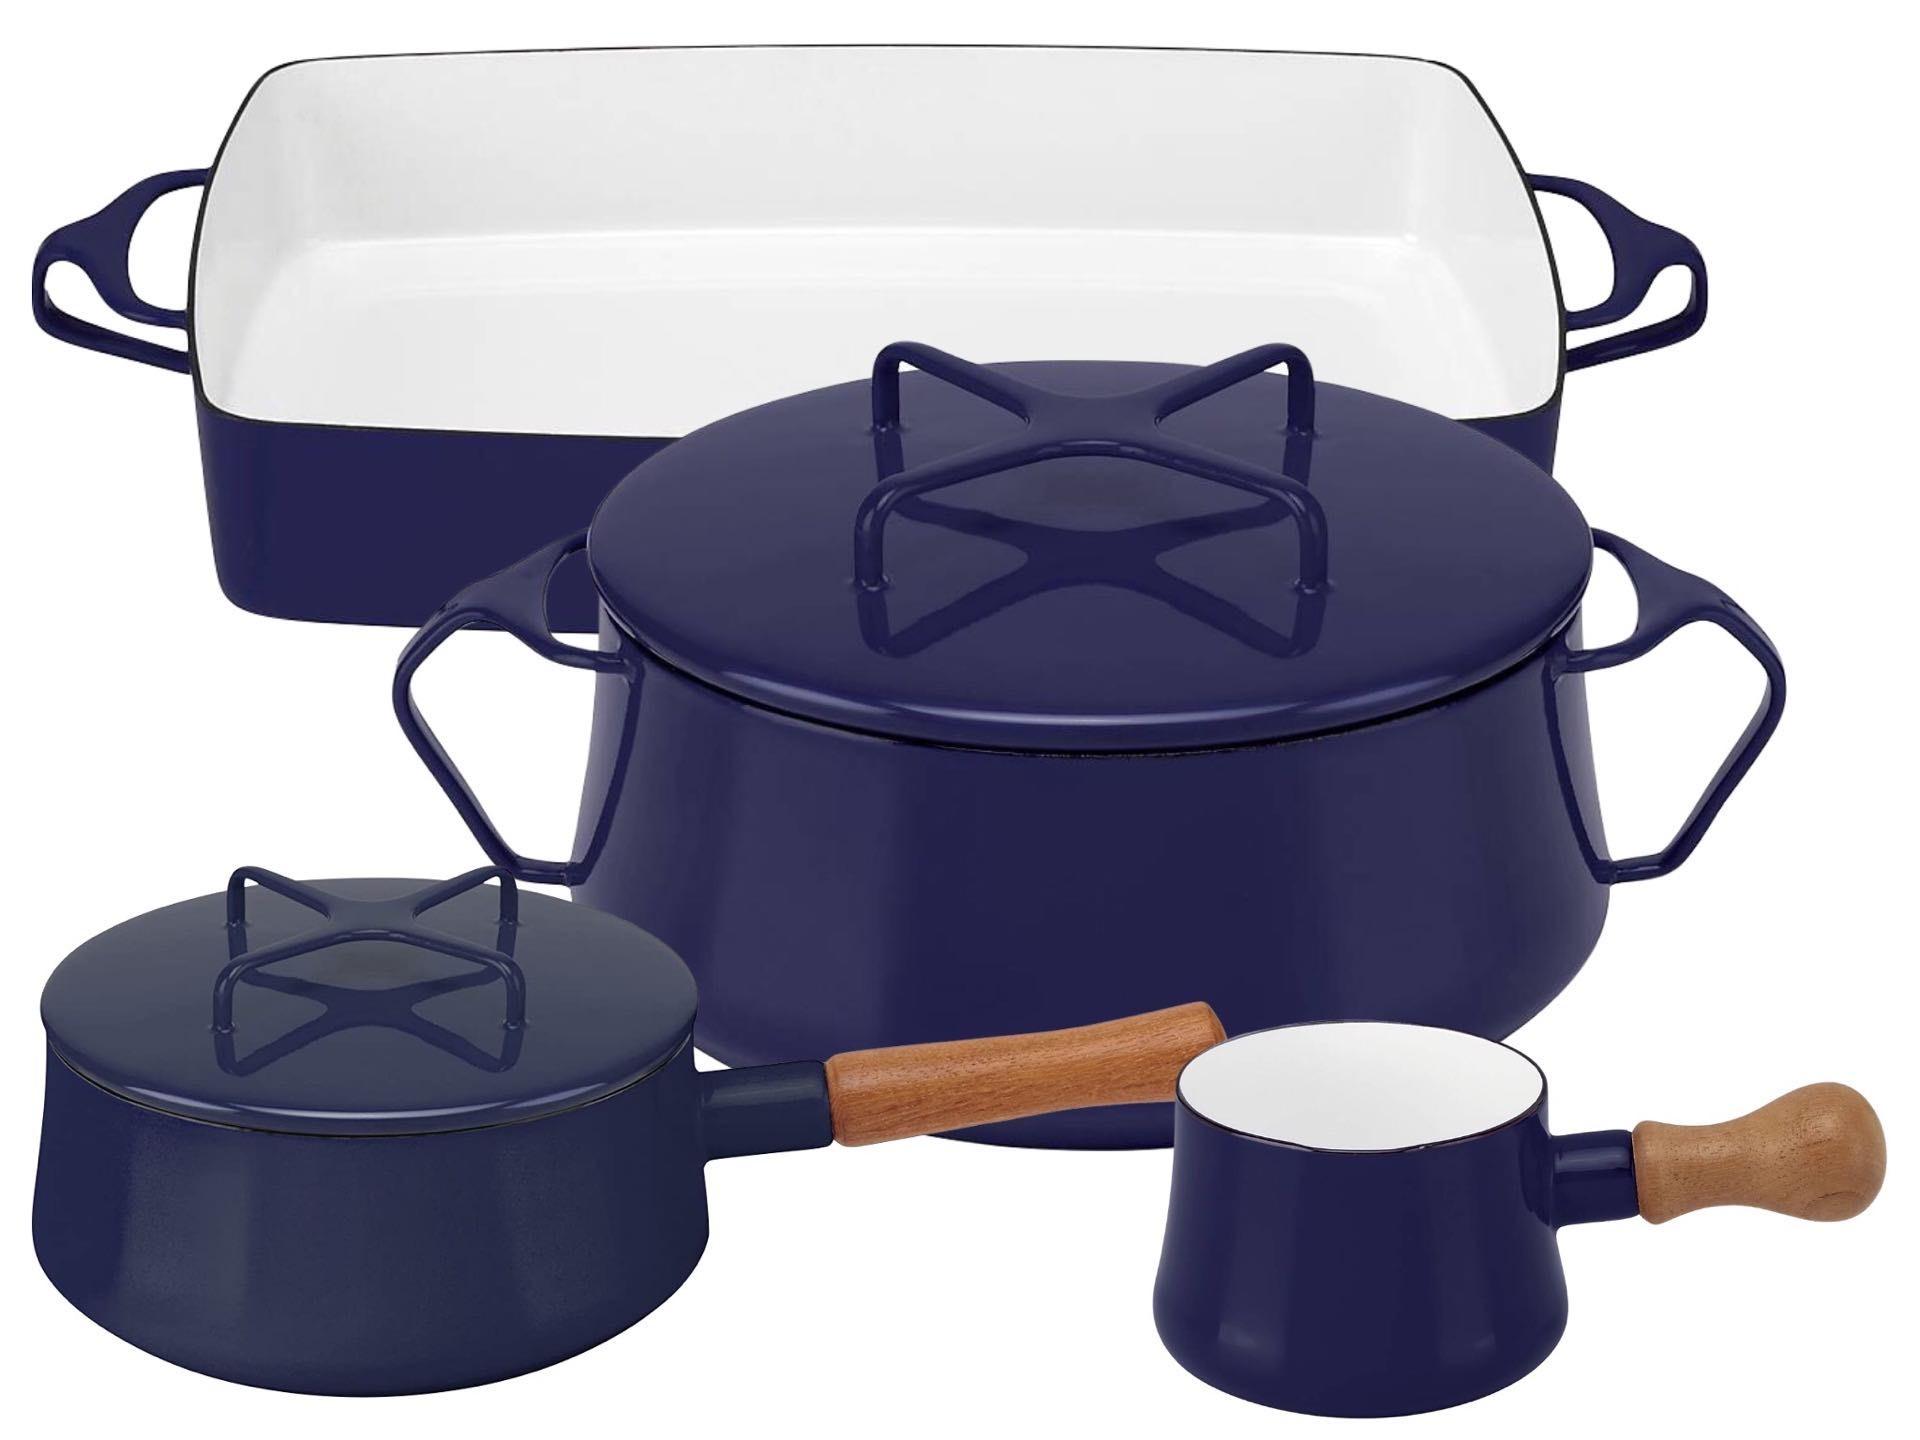 dansk-kobenstyle-cookware-in-midnight-blue-pieces